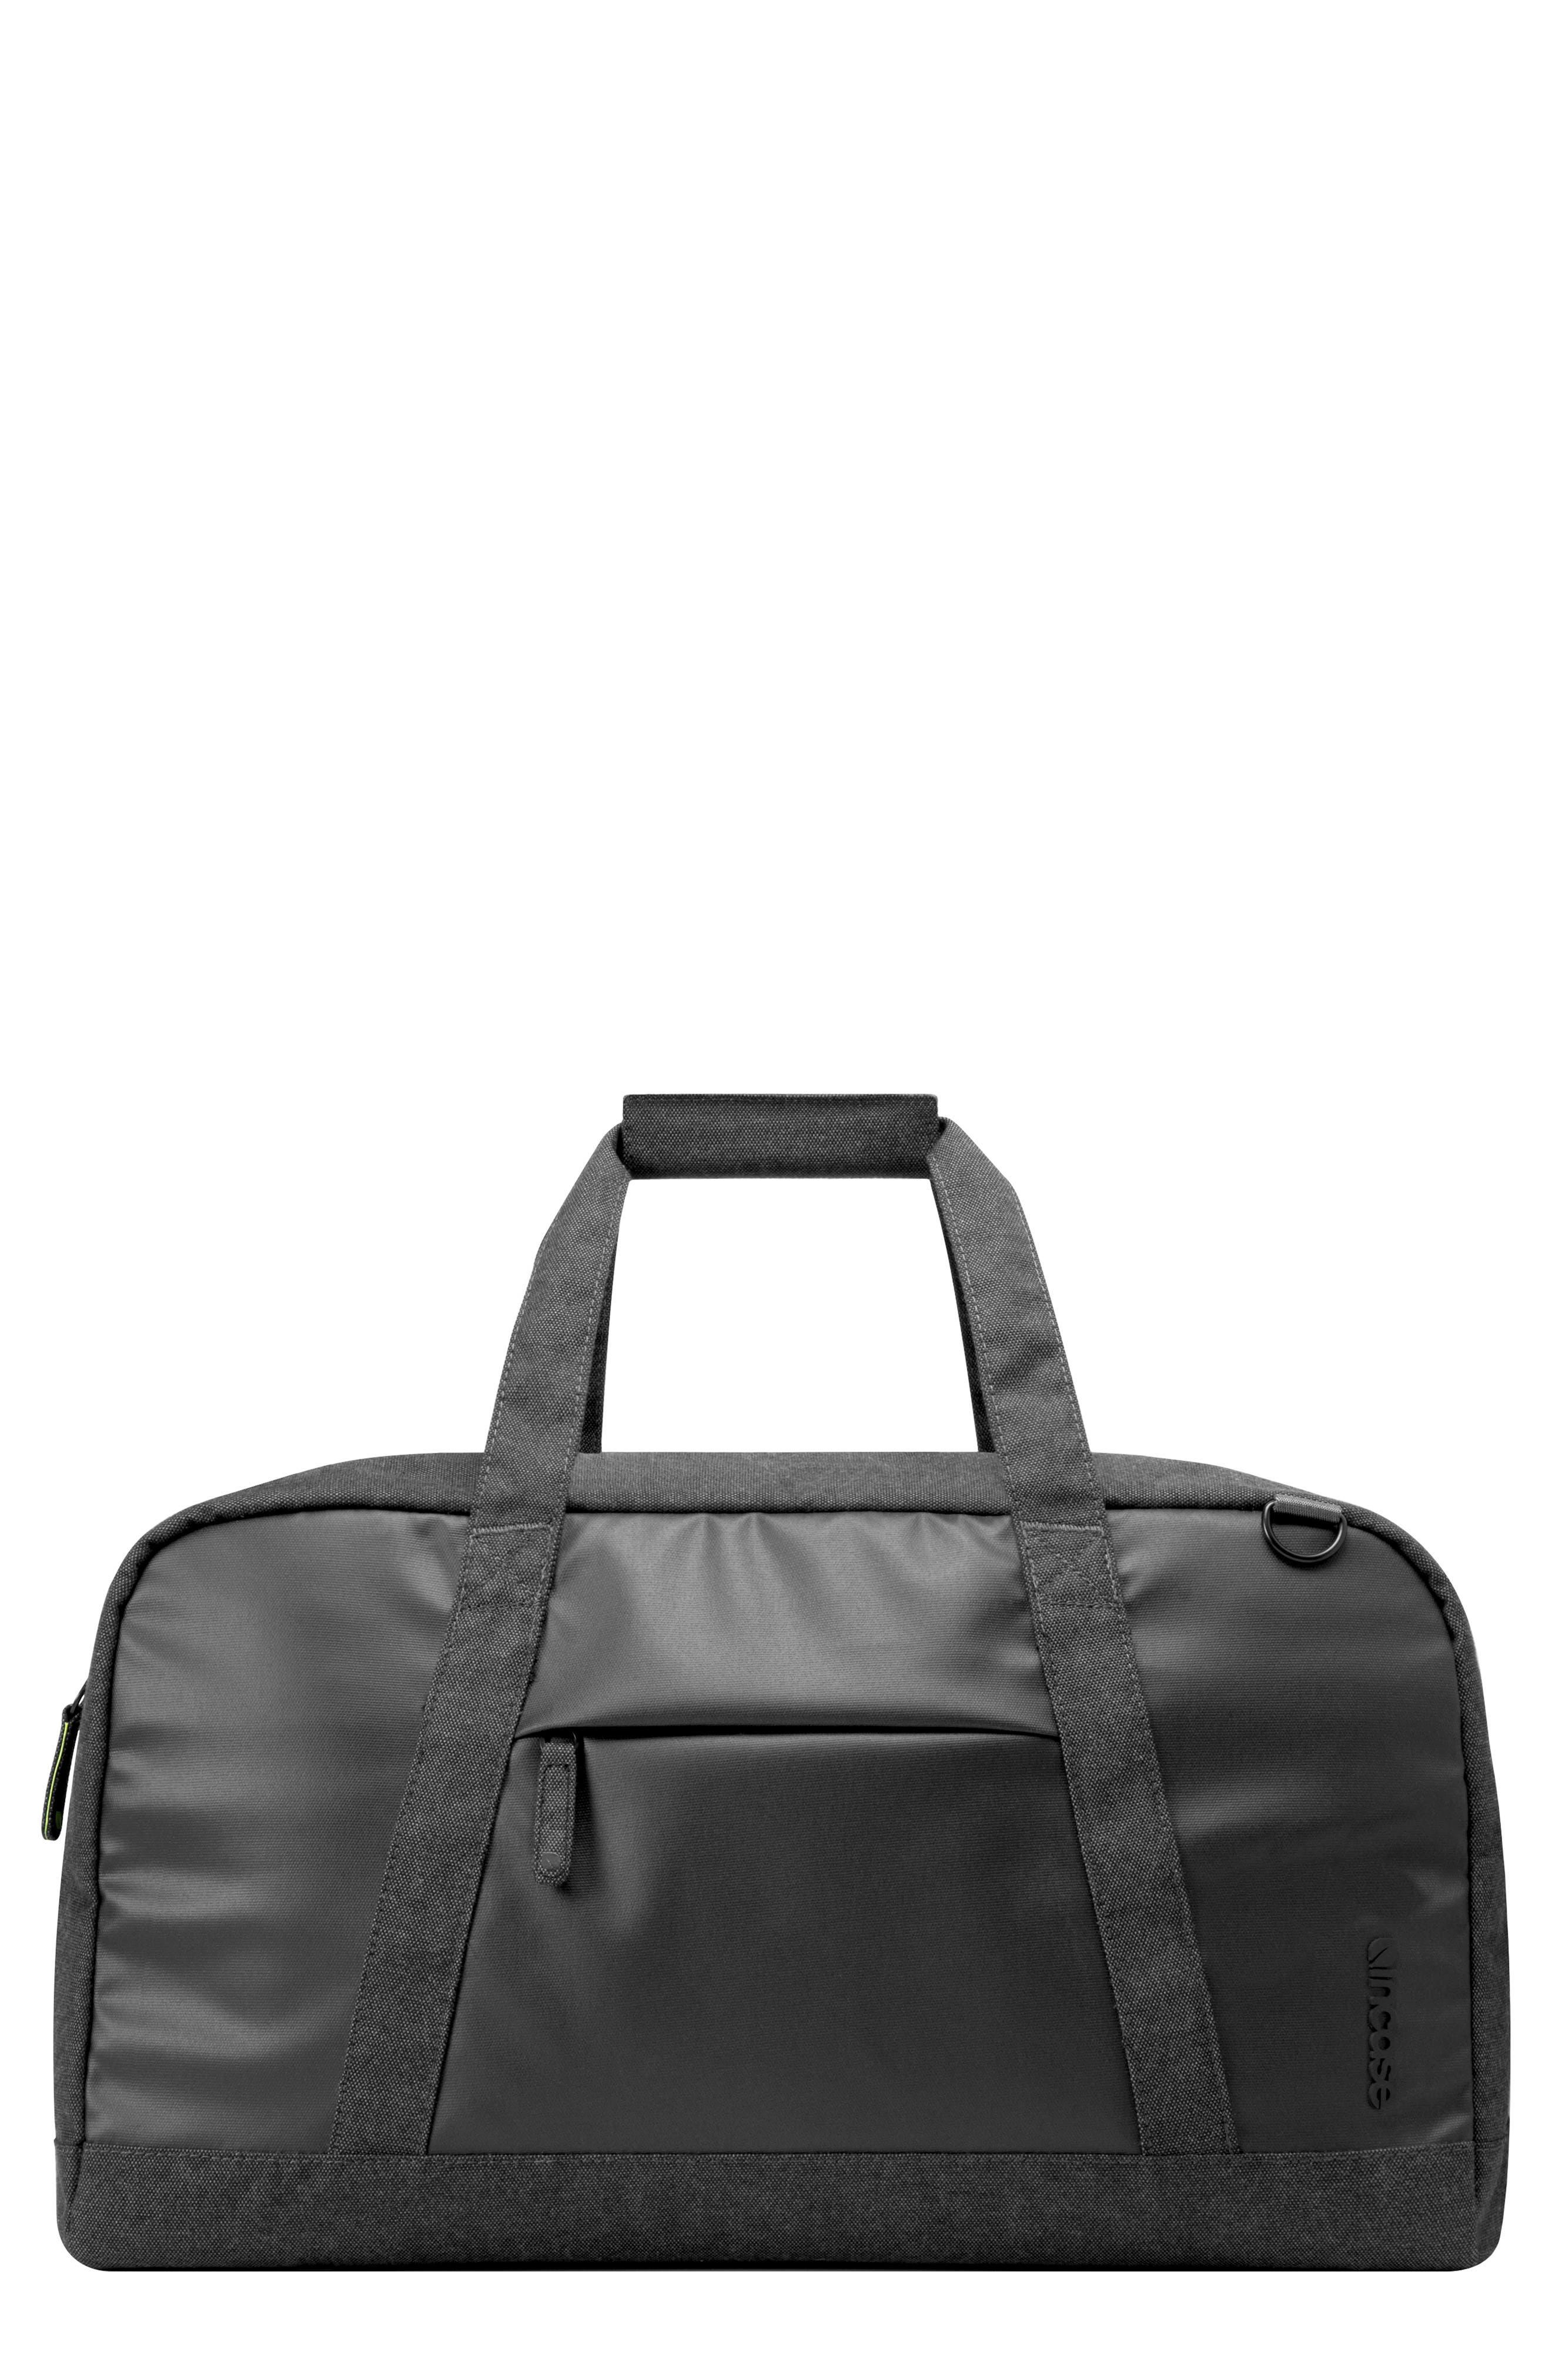 INCASE DESIGNS,                             EO Duffel Bag,                             Main thumbnail 1, color,                             BLACK